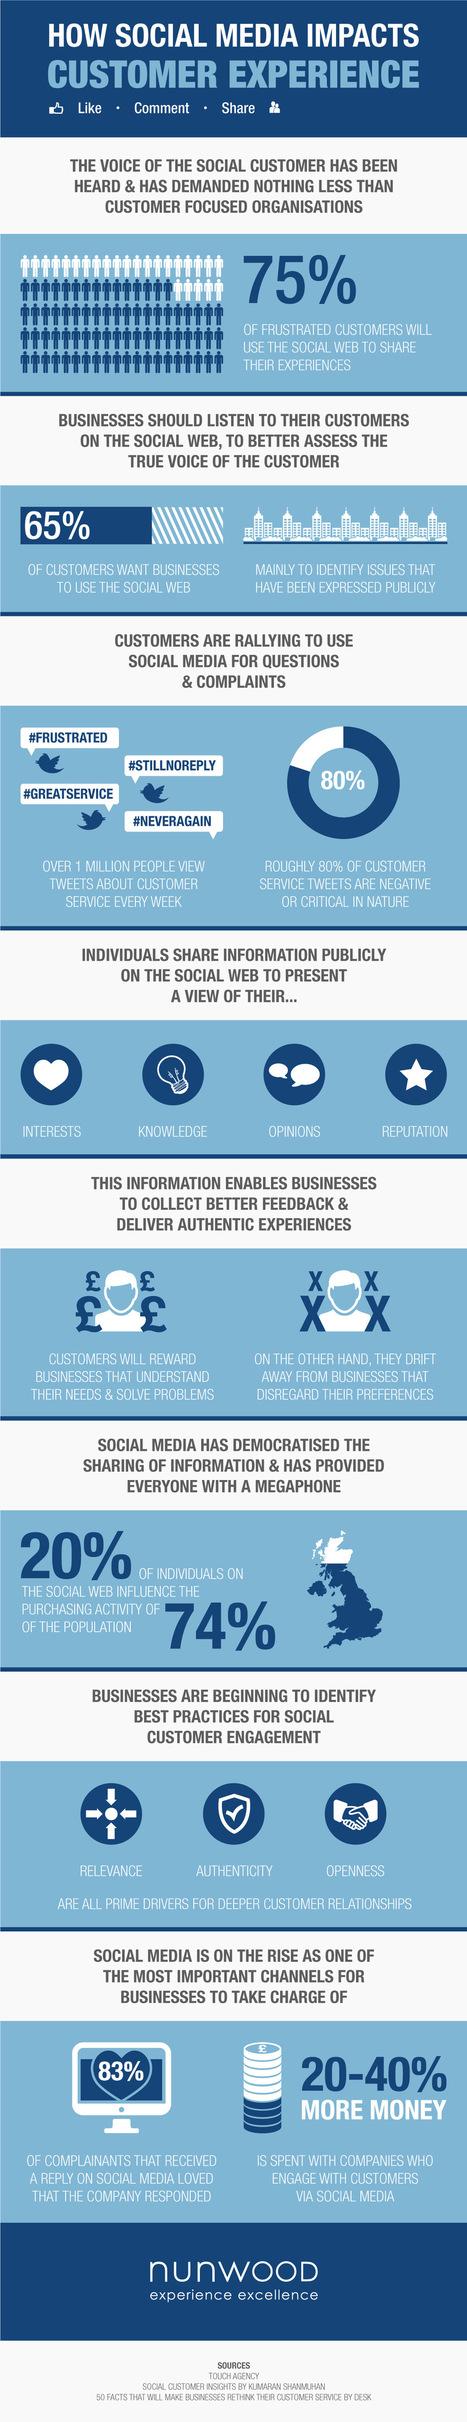 Nunwood | How Social Media Impacts Customer Experience | WIliB #CRM #Customer experience / journey | Scoop.it